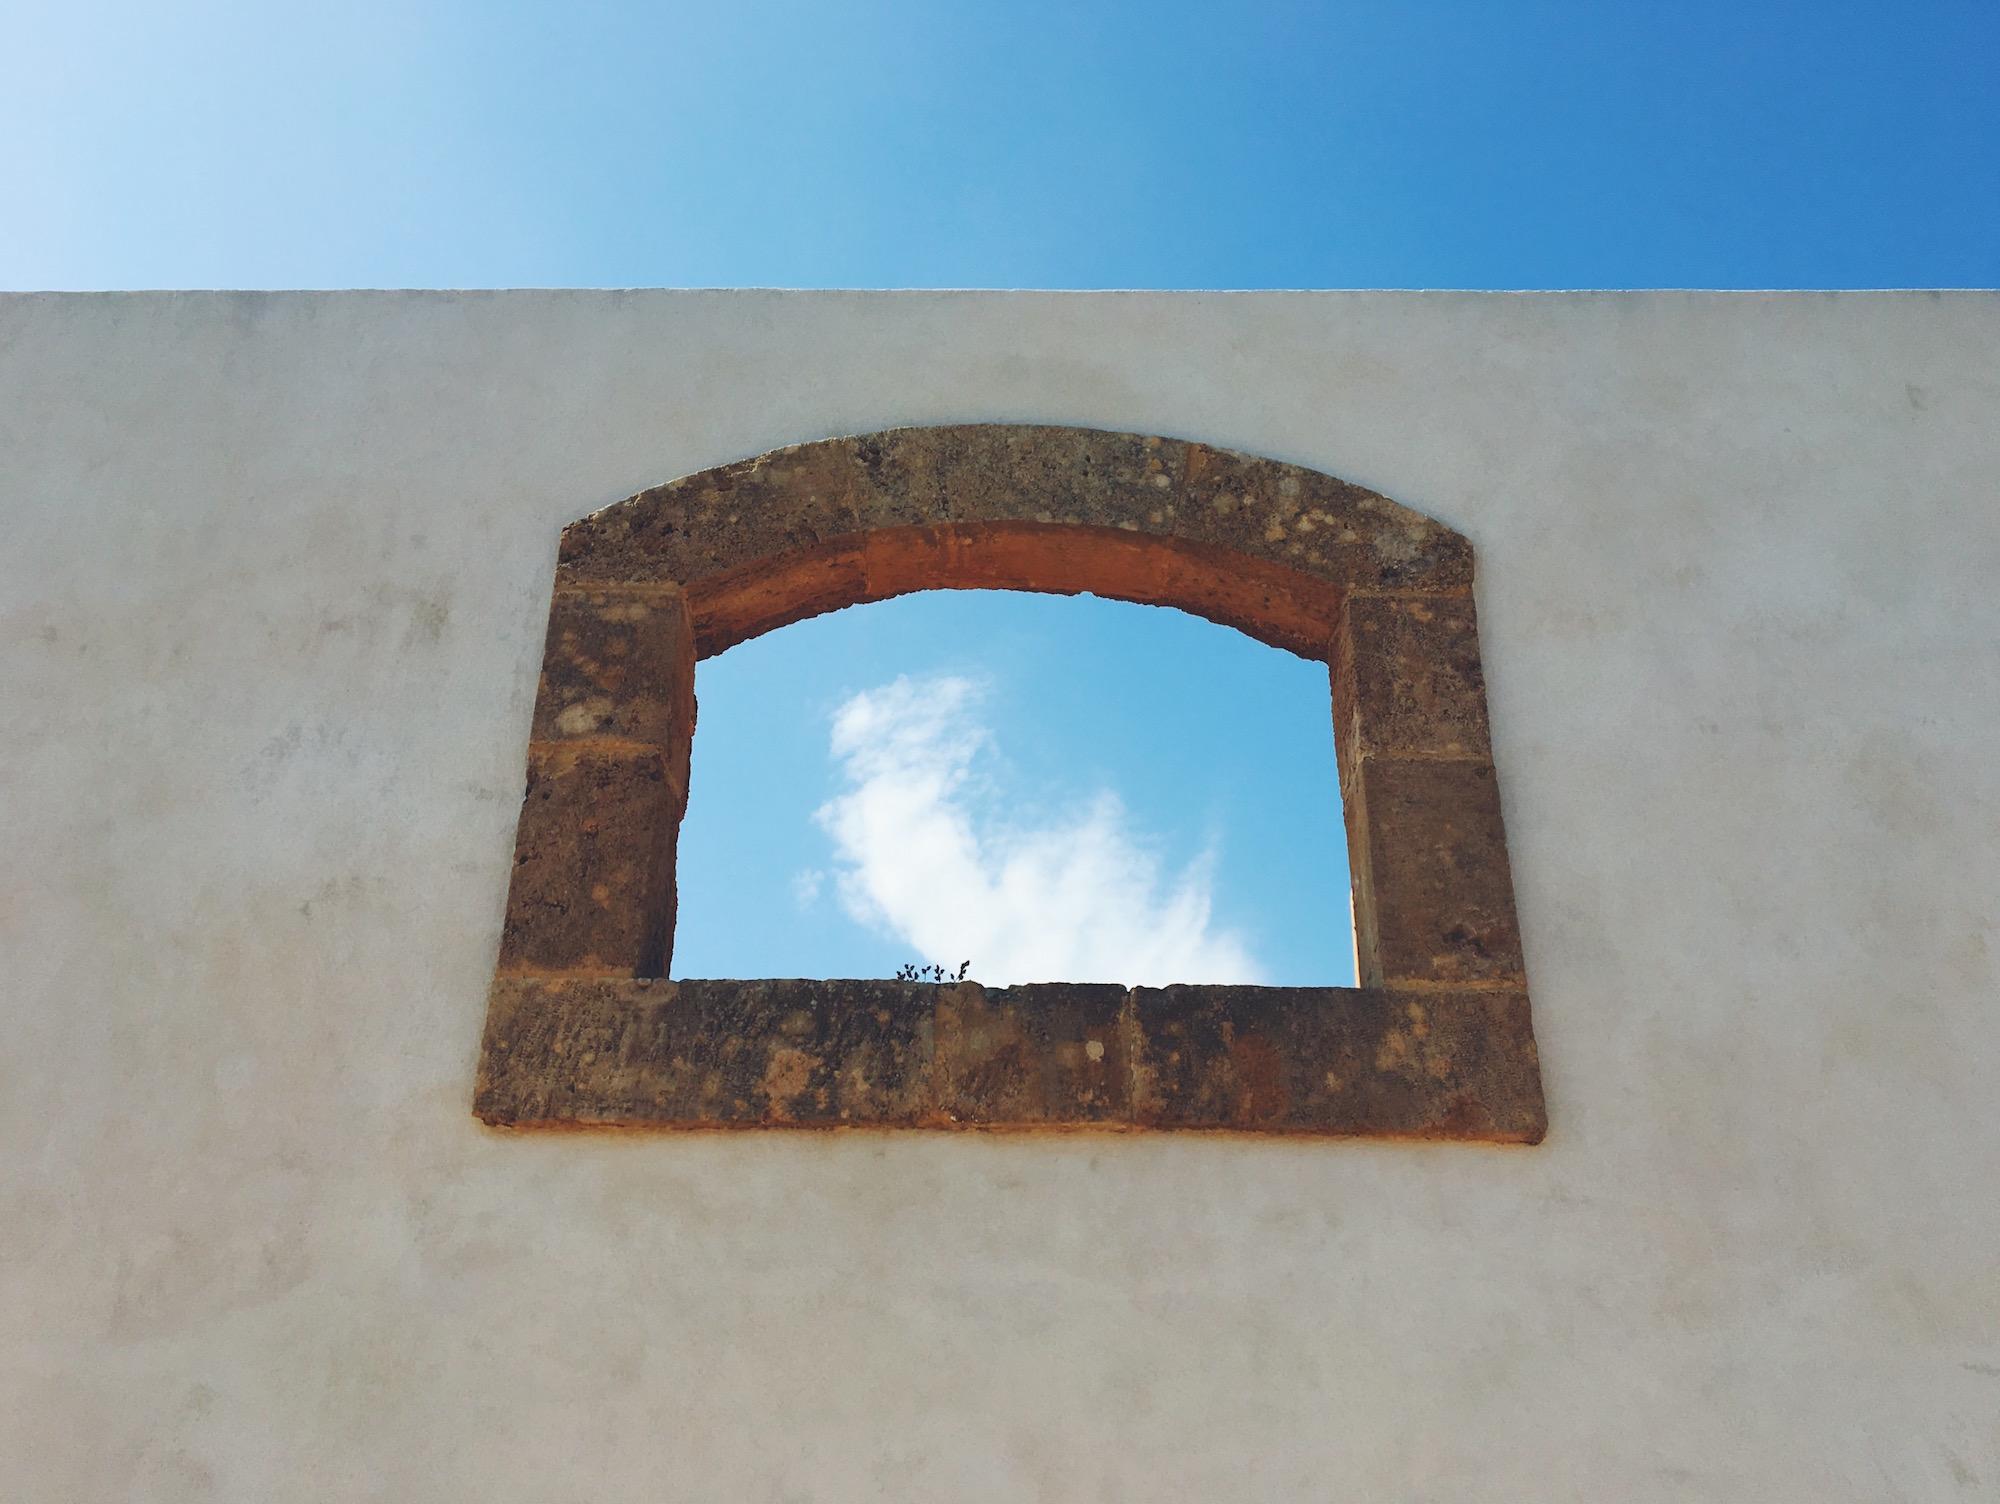 Una finestra sul cielo